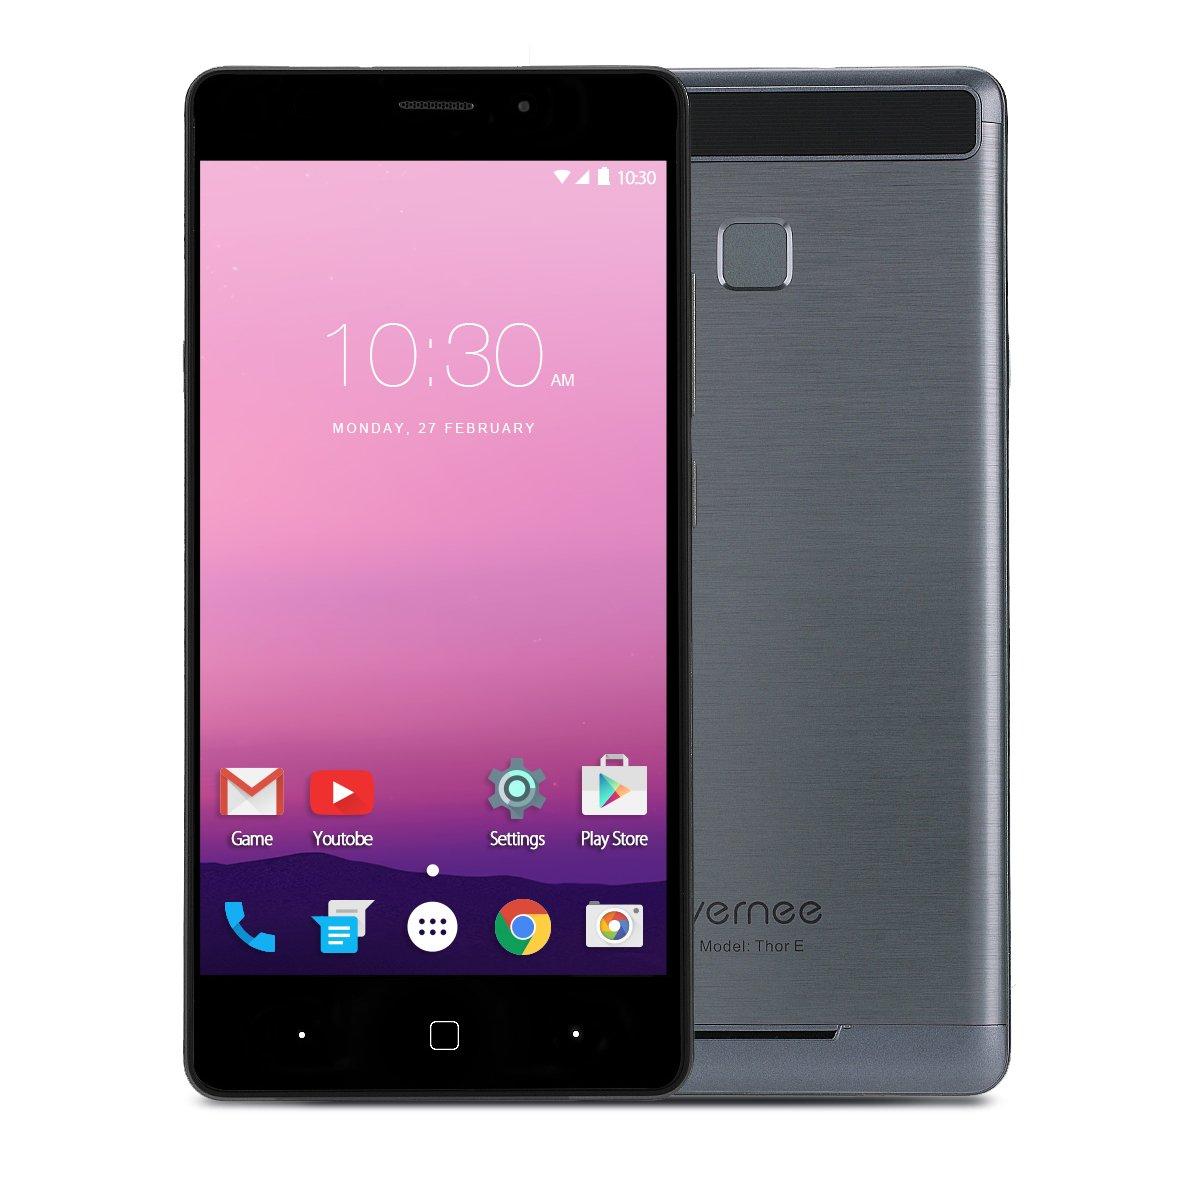 Teléfono Móvil Libre,Vernee Thor E 5.0 Pulgadas 4G Smartphone ...